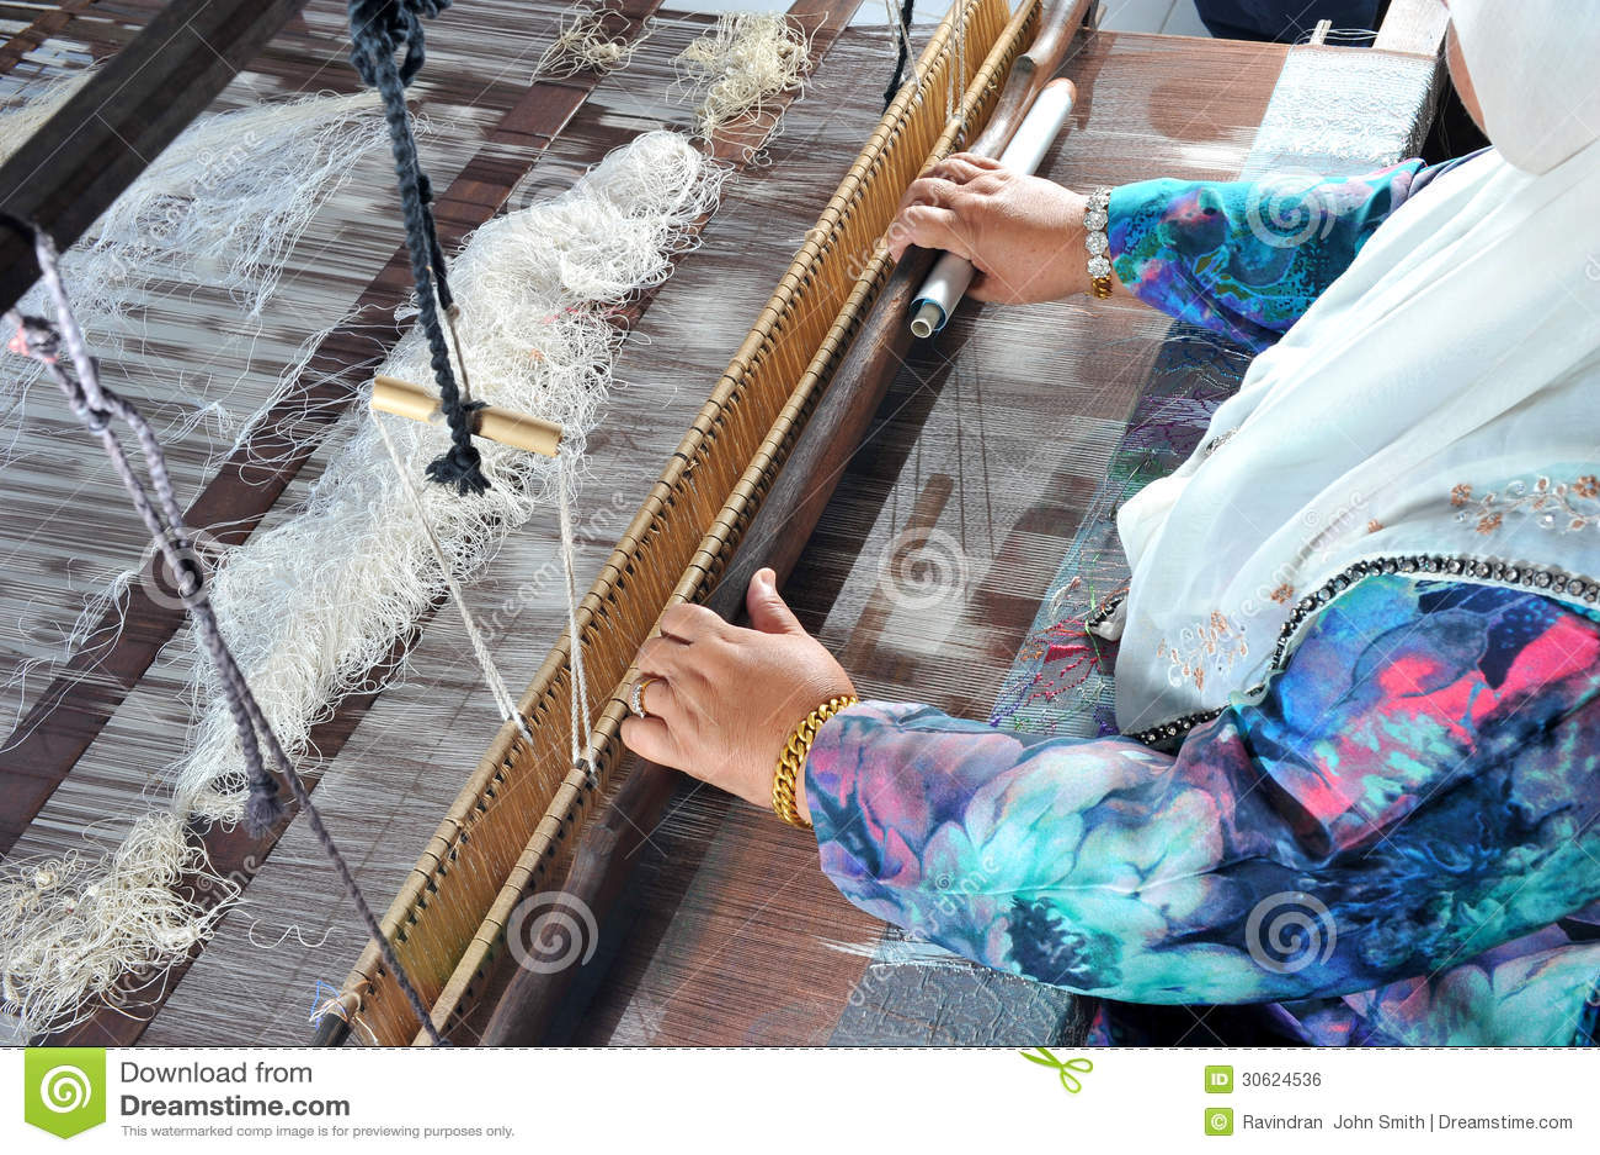 Batik design royalty free stock photos image 29546988 - Songket Weaving Royalty Free Stock Image